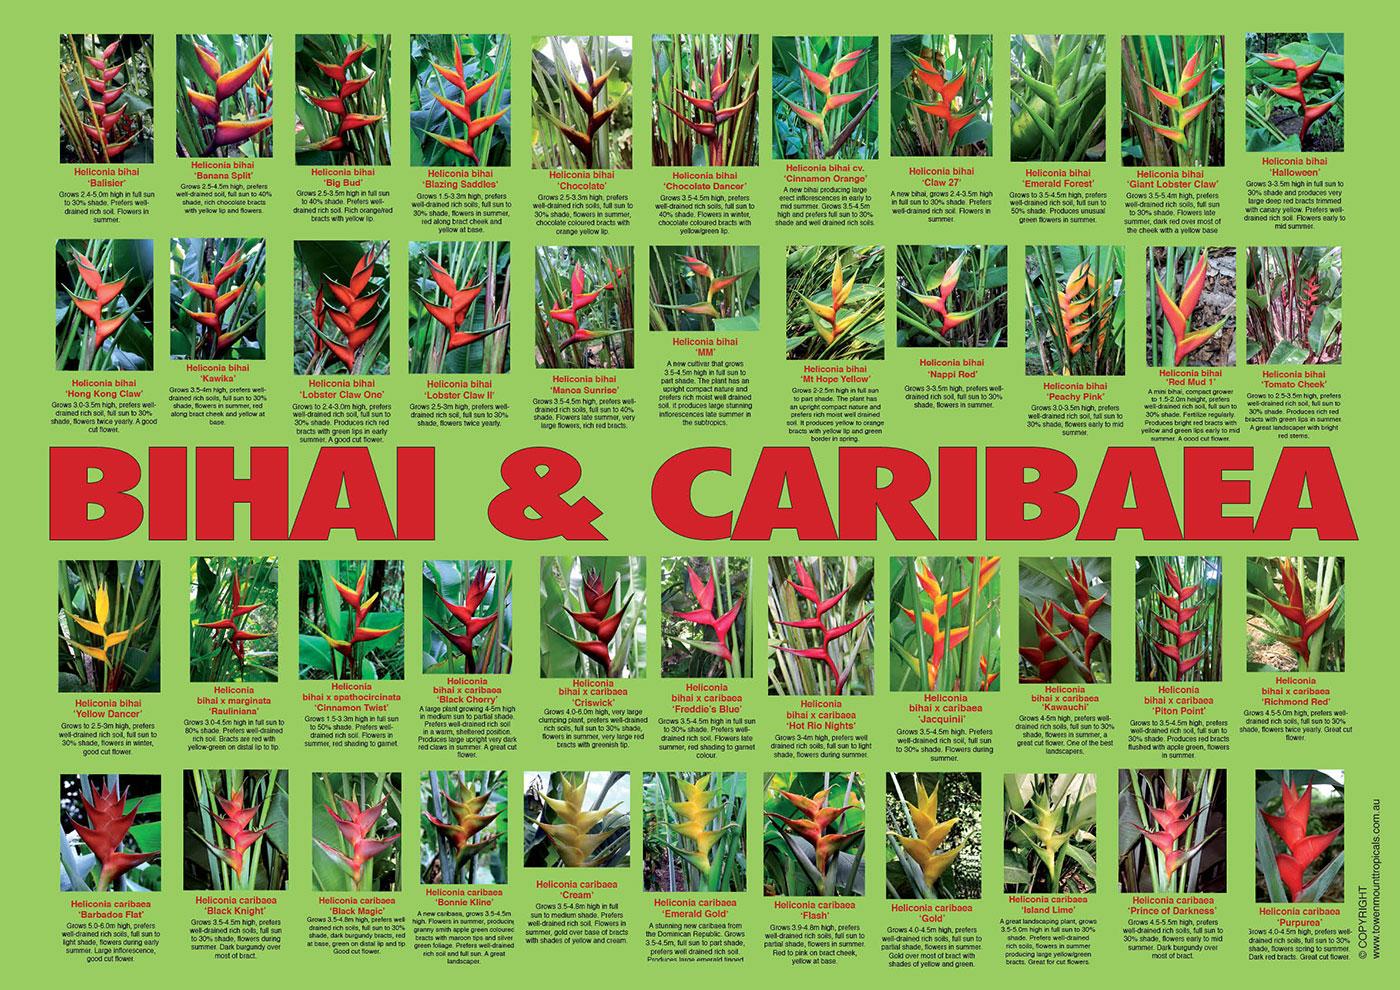 bihai-bihai-caribaeas-poster-web-1400px